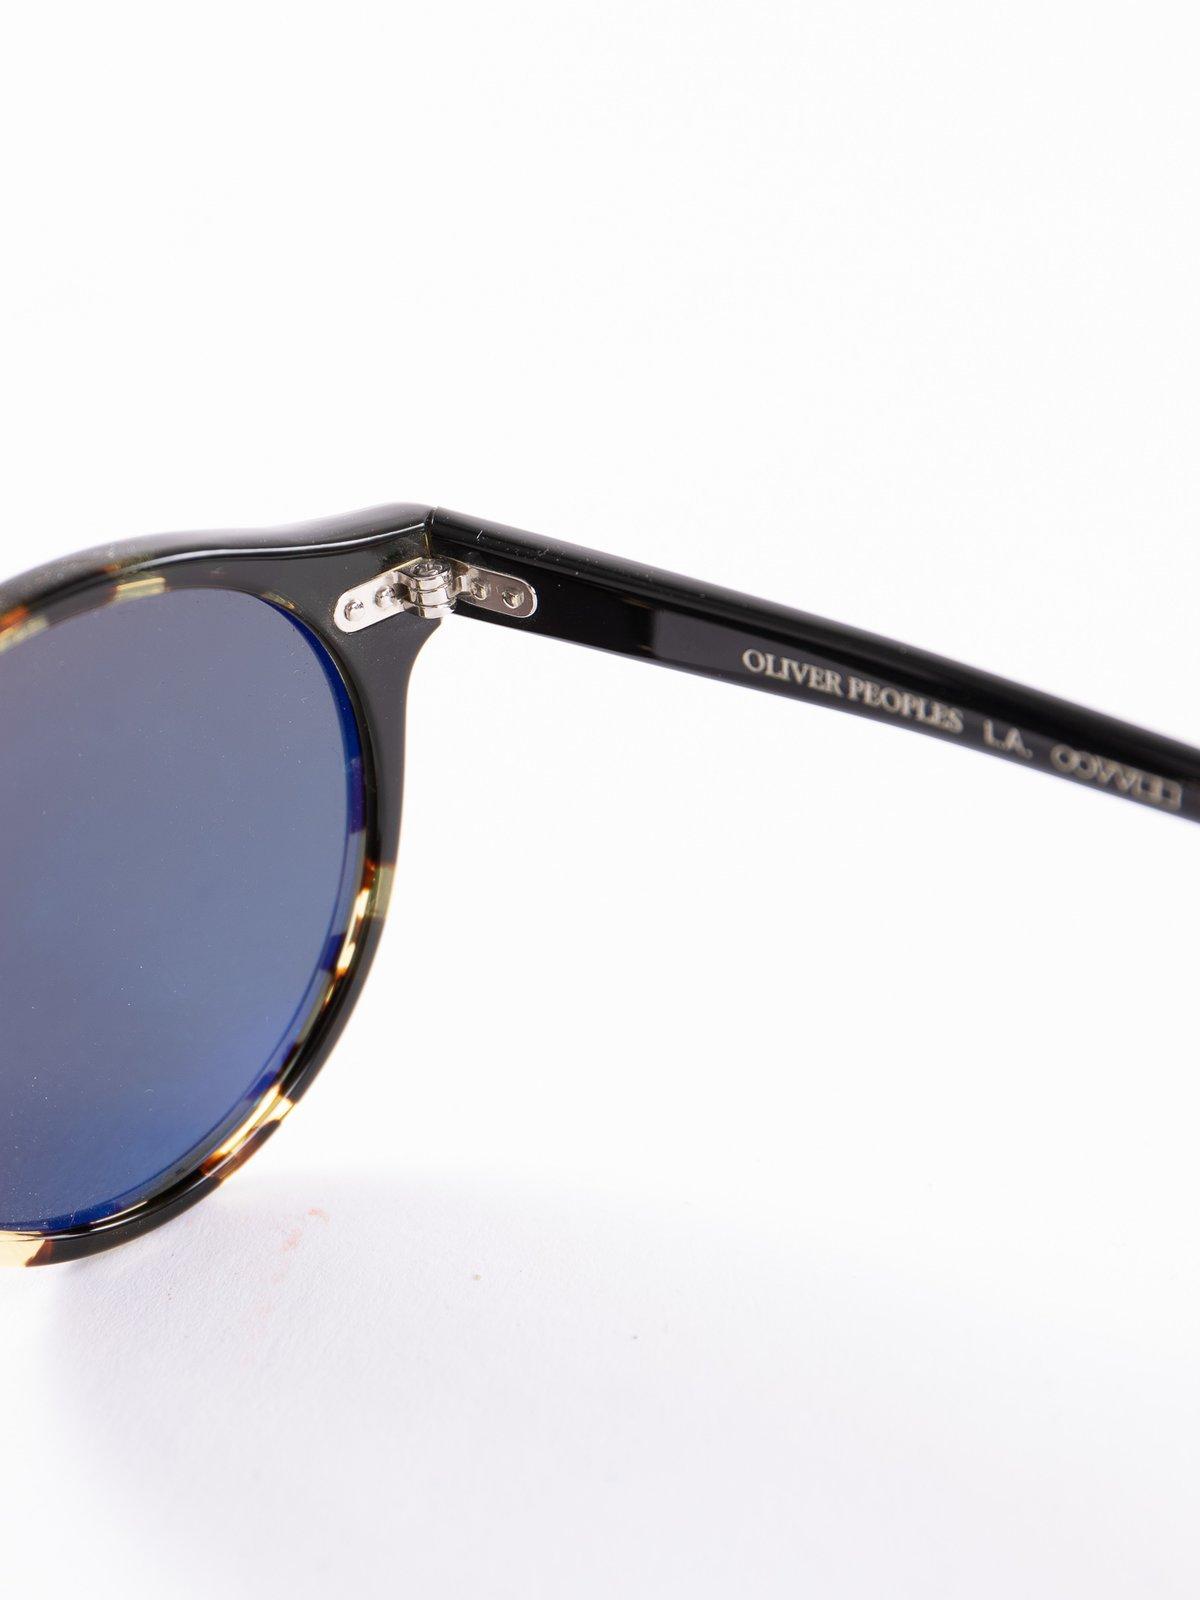 Black–DTBK Gradient/Green Polar Gregory Peck Sunglasses - Image 4